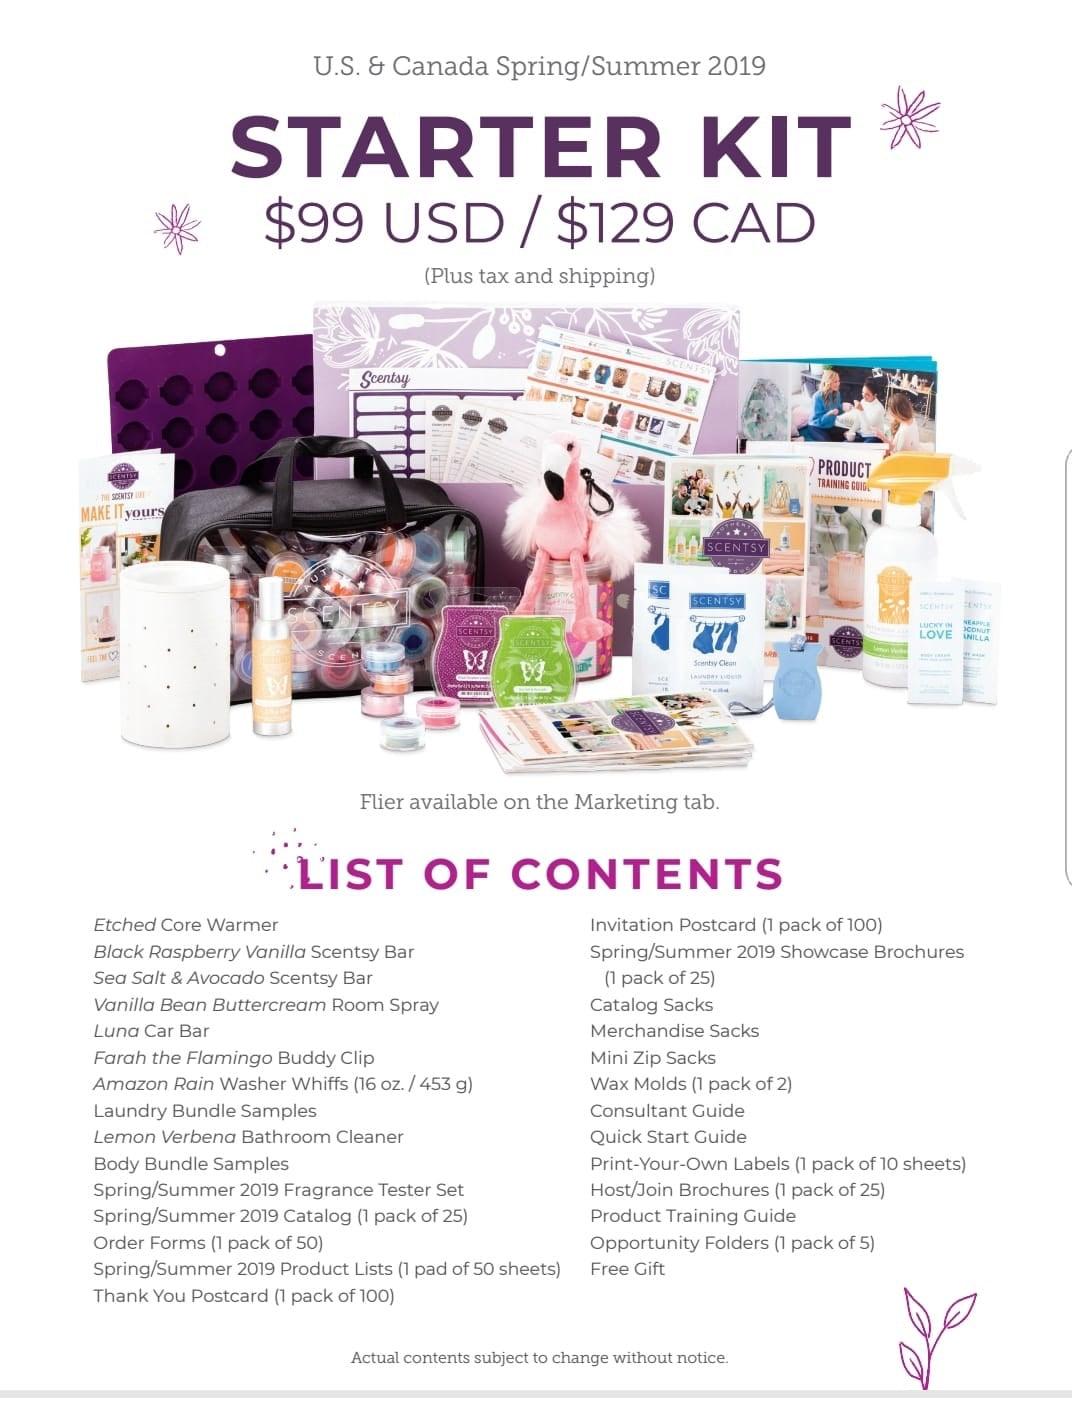 Scentsy Starter Kit 2019